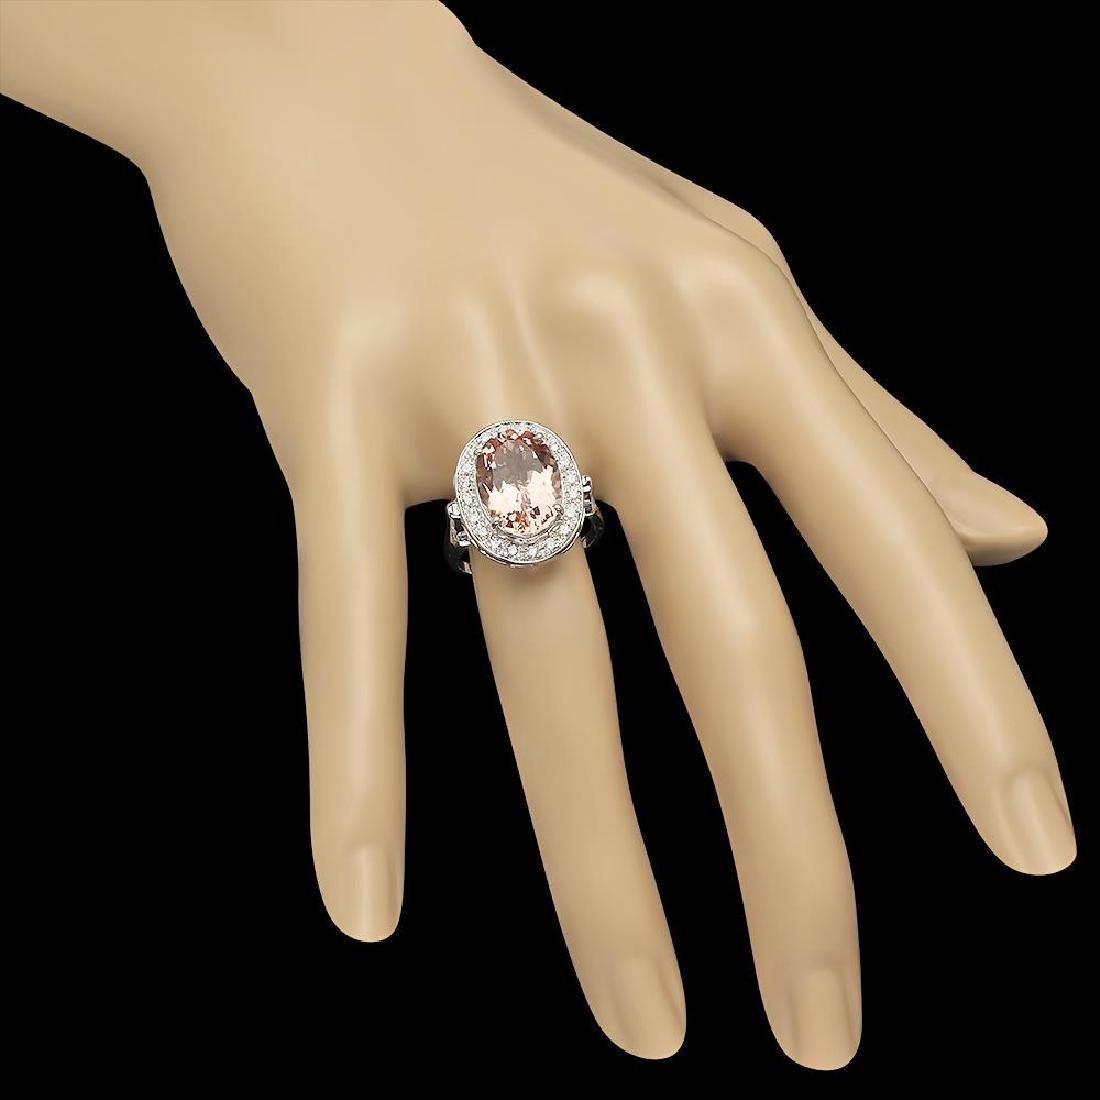 14K Gold 5.97ct Morganite 0.52ct Diamond Ring - 3